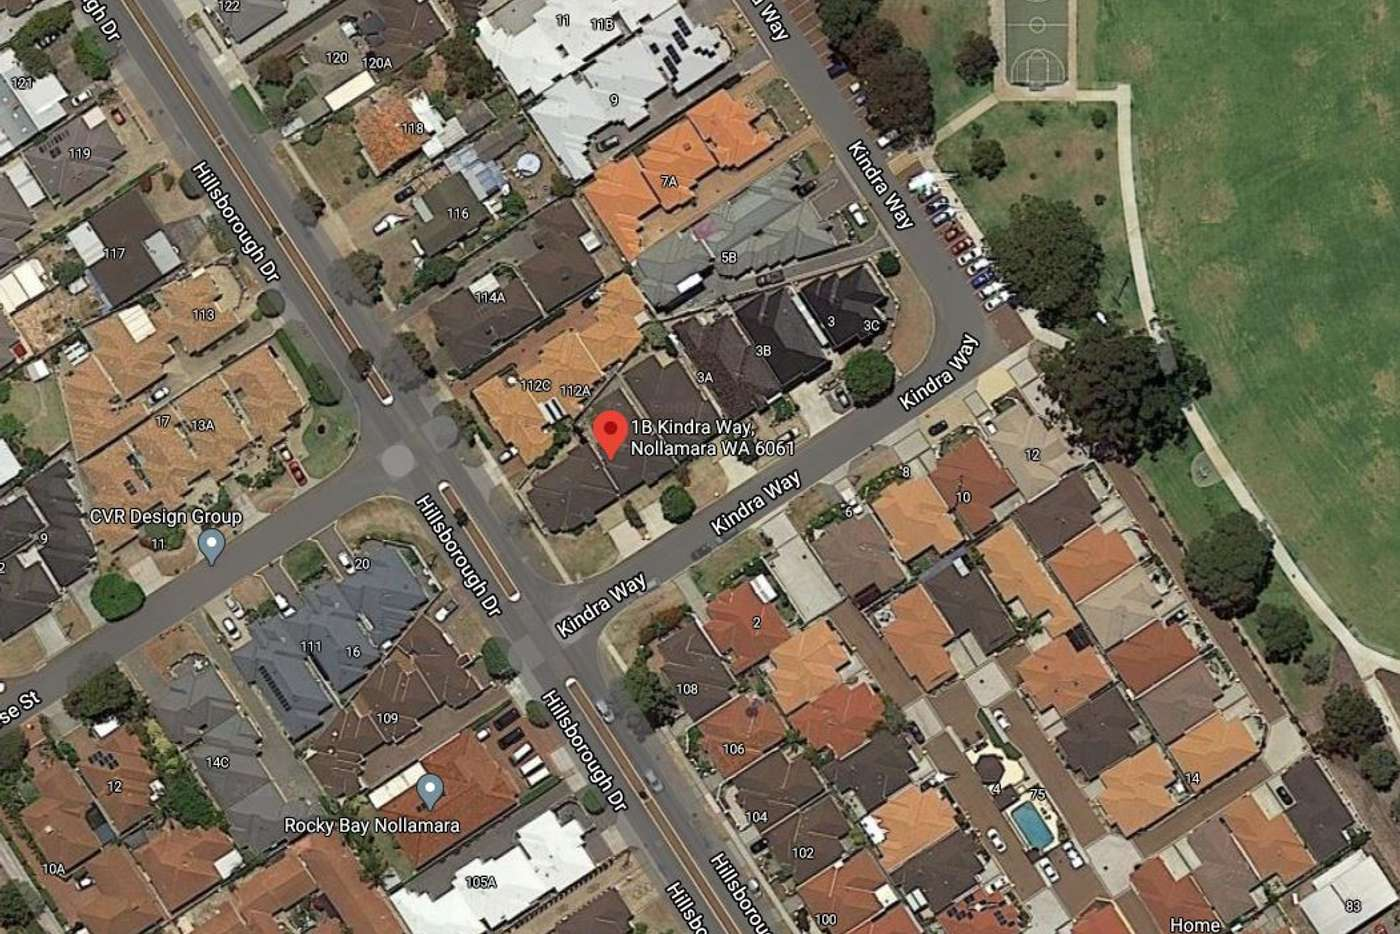 Main view of Homely house listing, 1B Kindra Way, Nollamara WA 6061